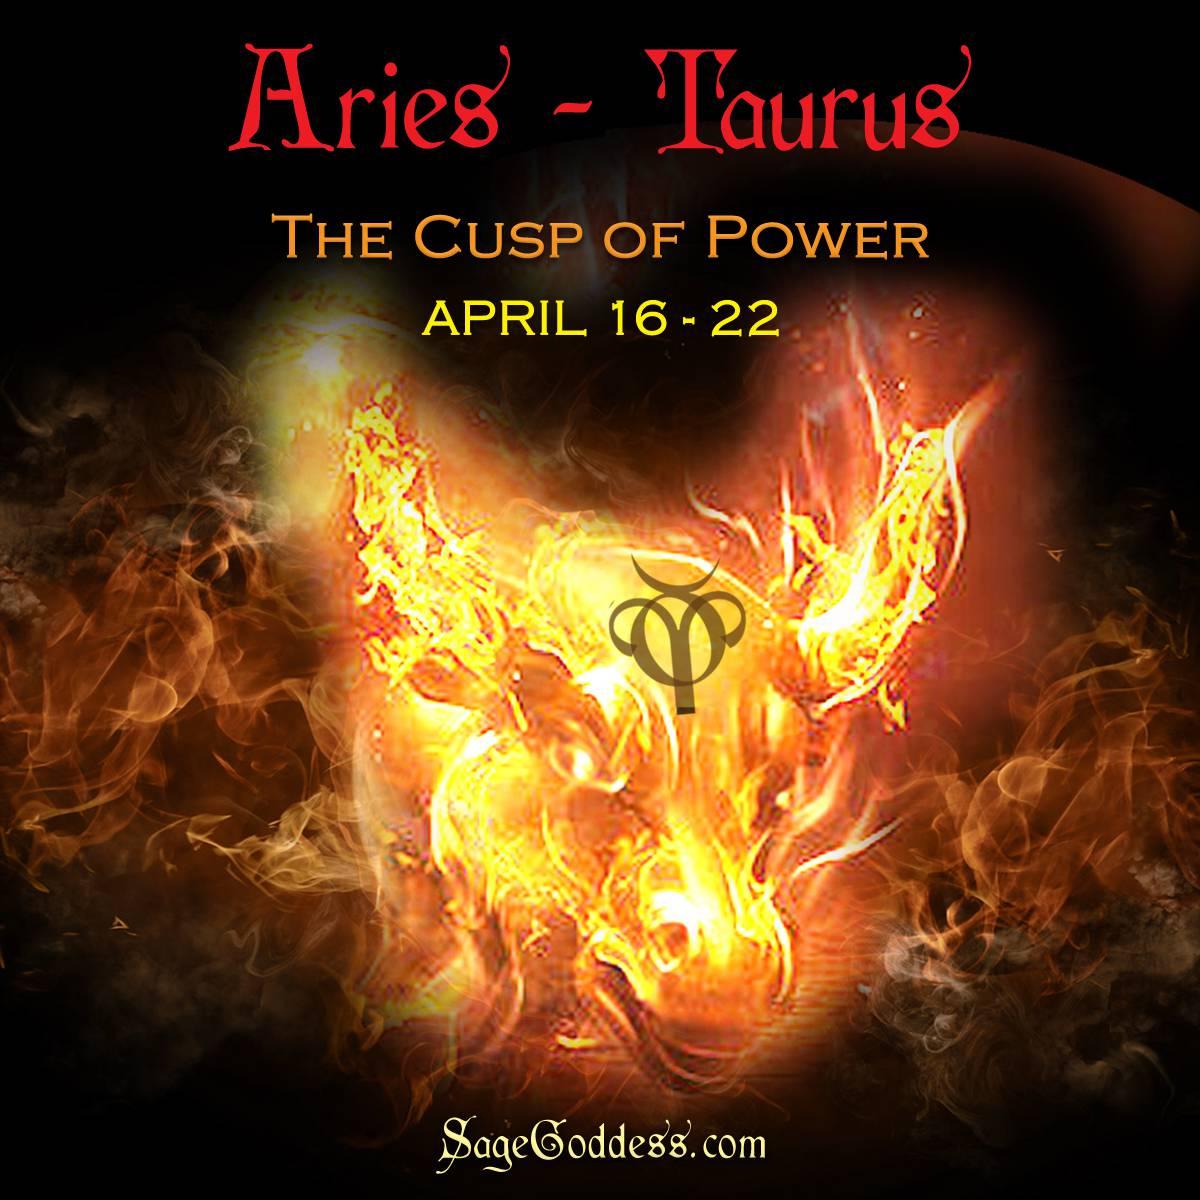 aries-taurus cusp - Sage Goddess